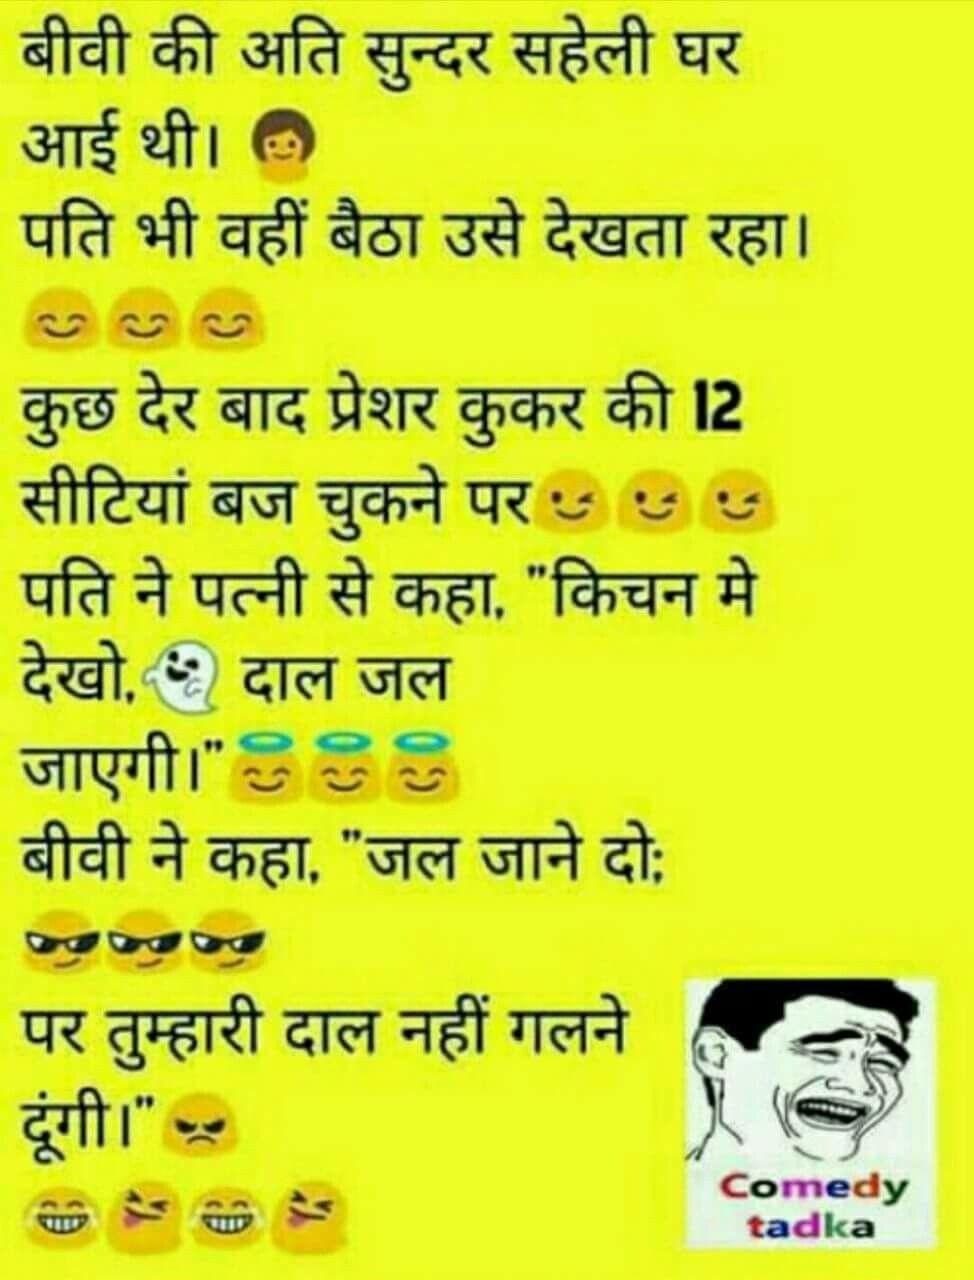 Funny Jokes Quotes Pinnarendra Pal Singh On Jokes  Pinterest